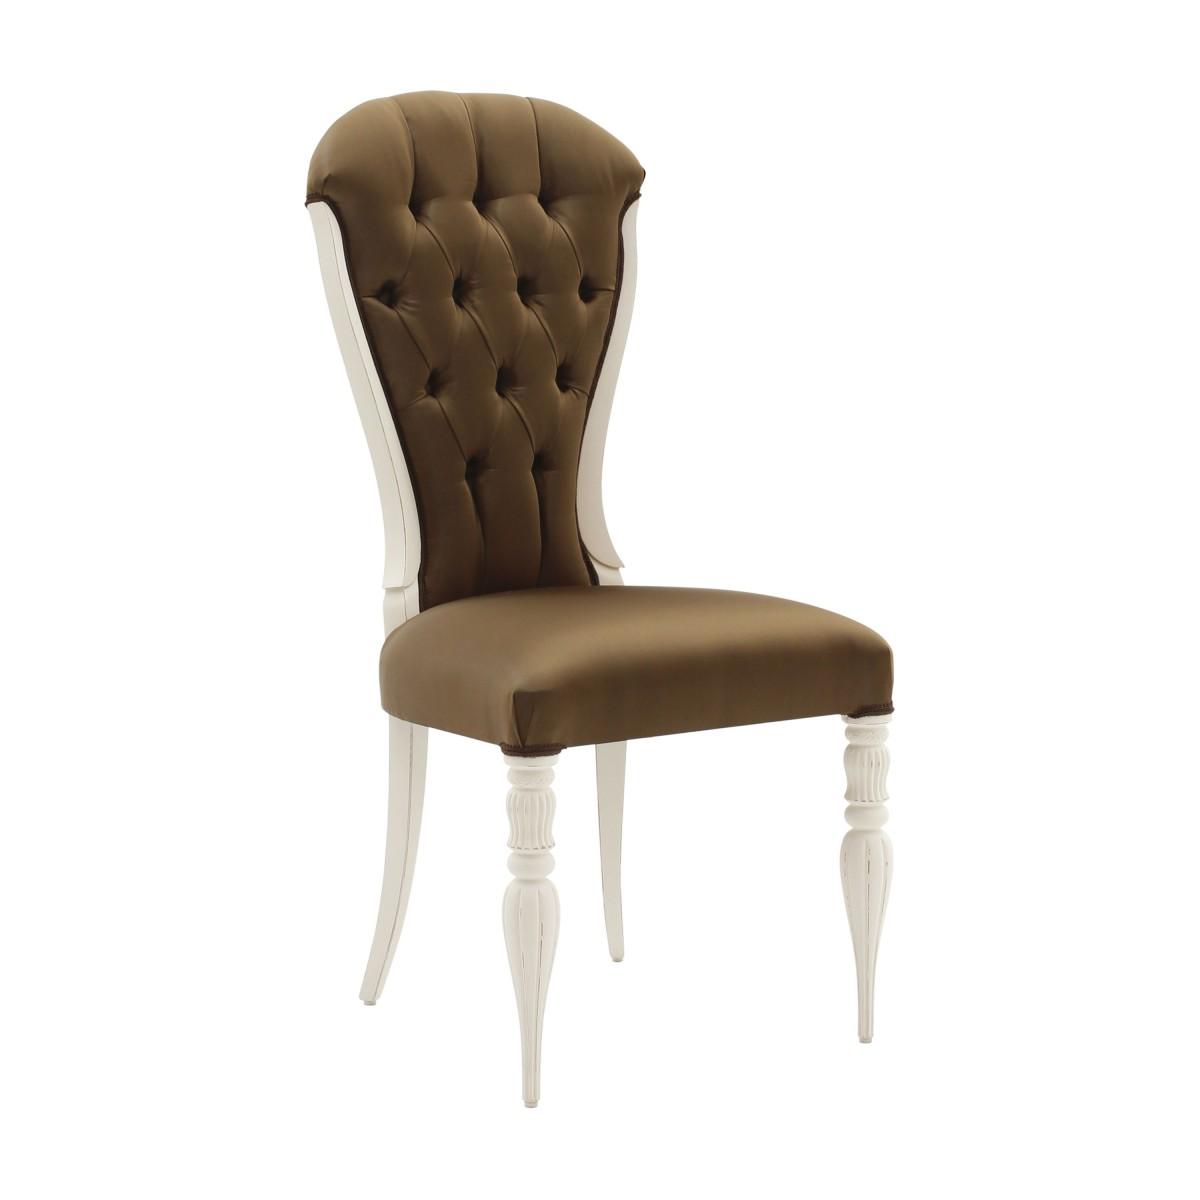 italian chair adele 1751